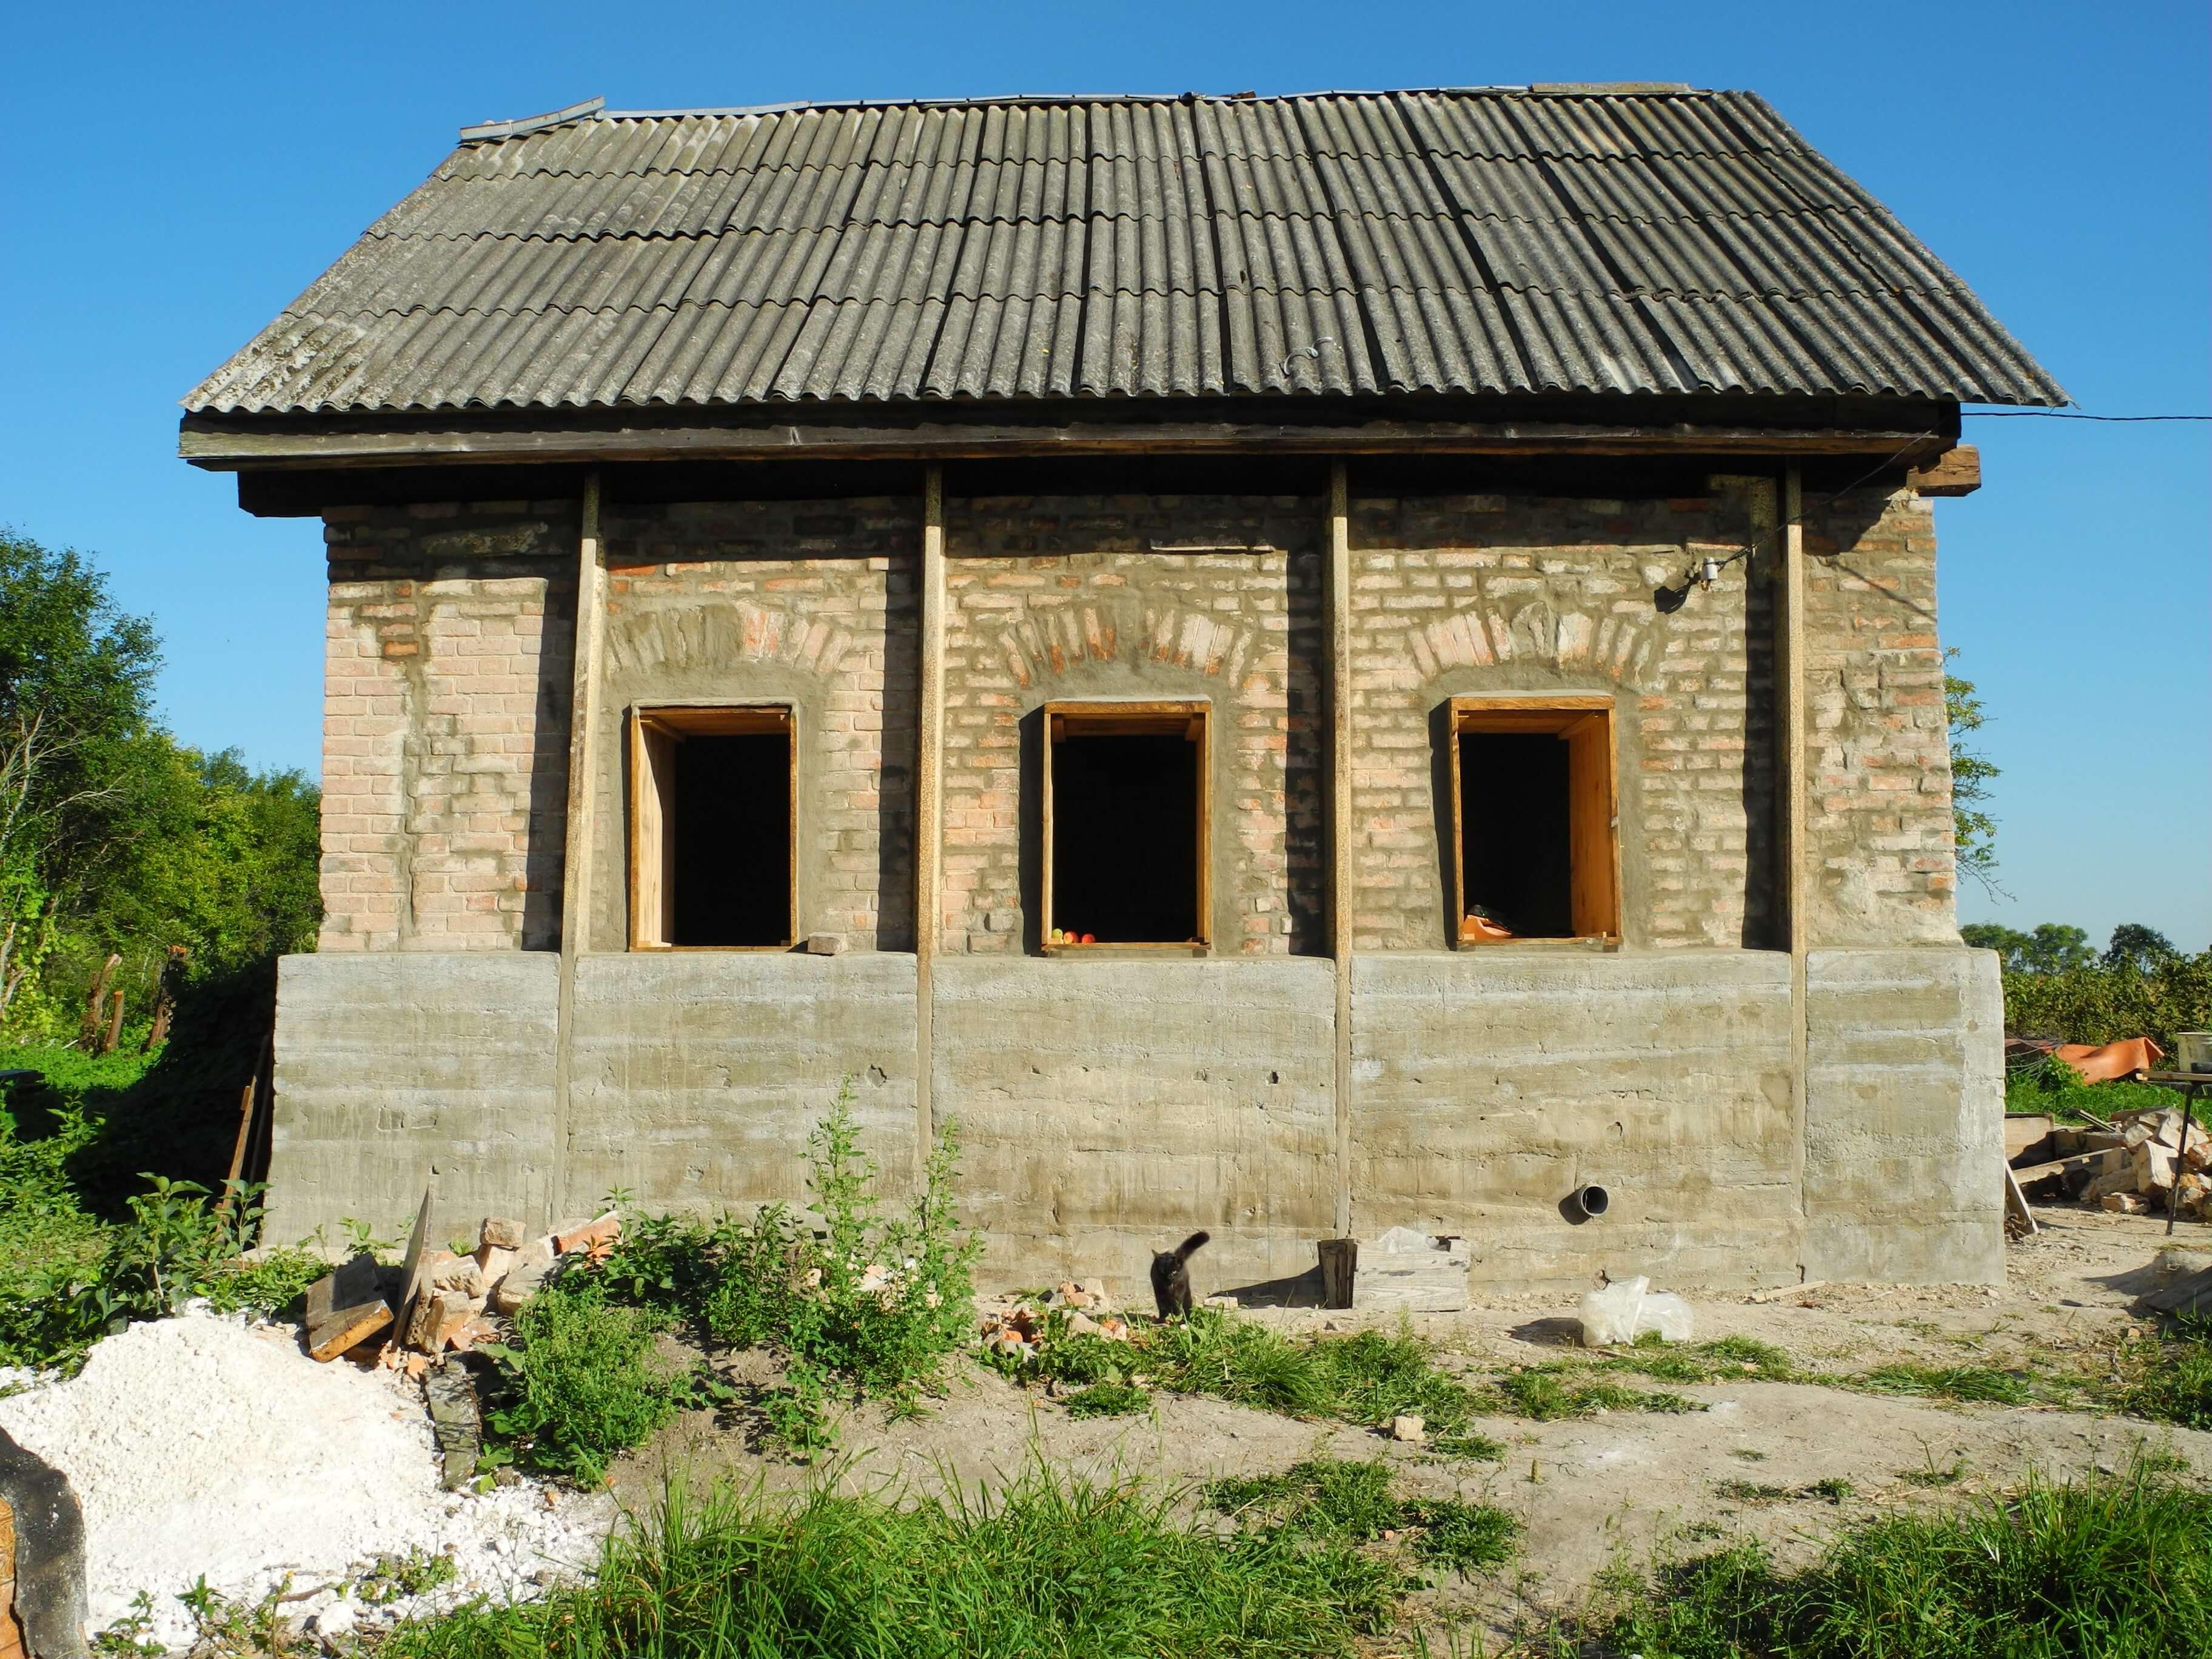 Ремонт стен и фундамента кирпичного старого дома